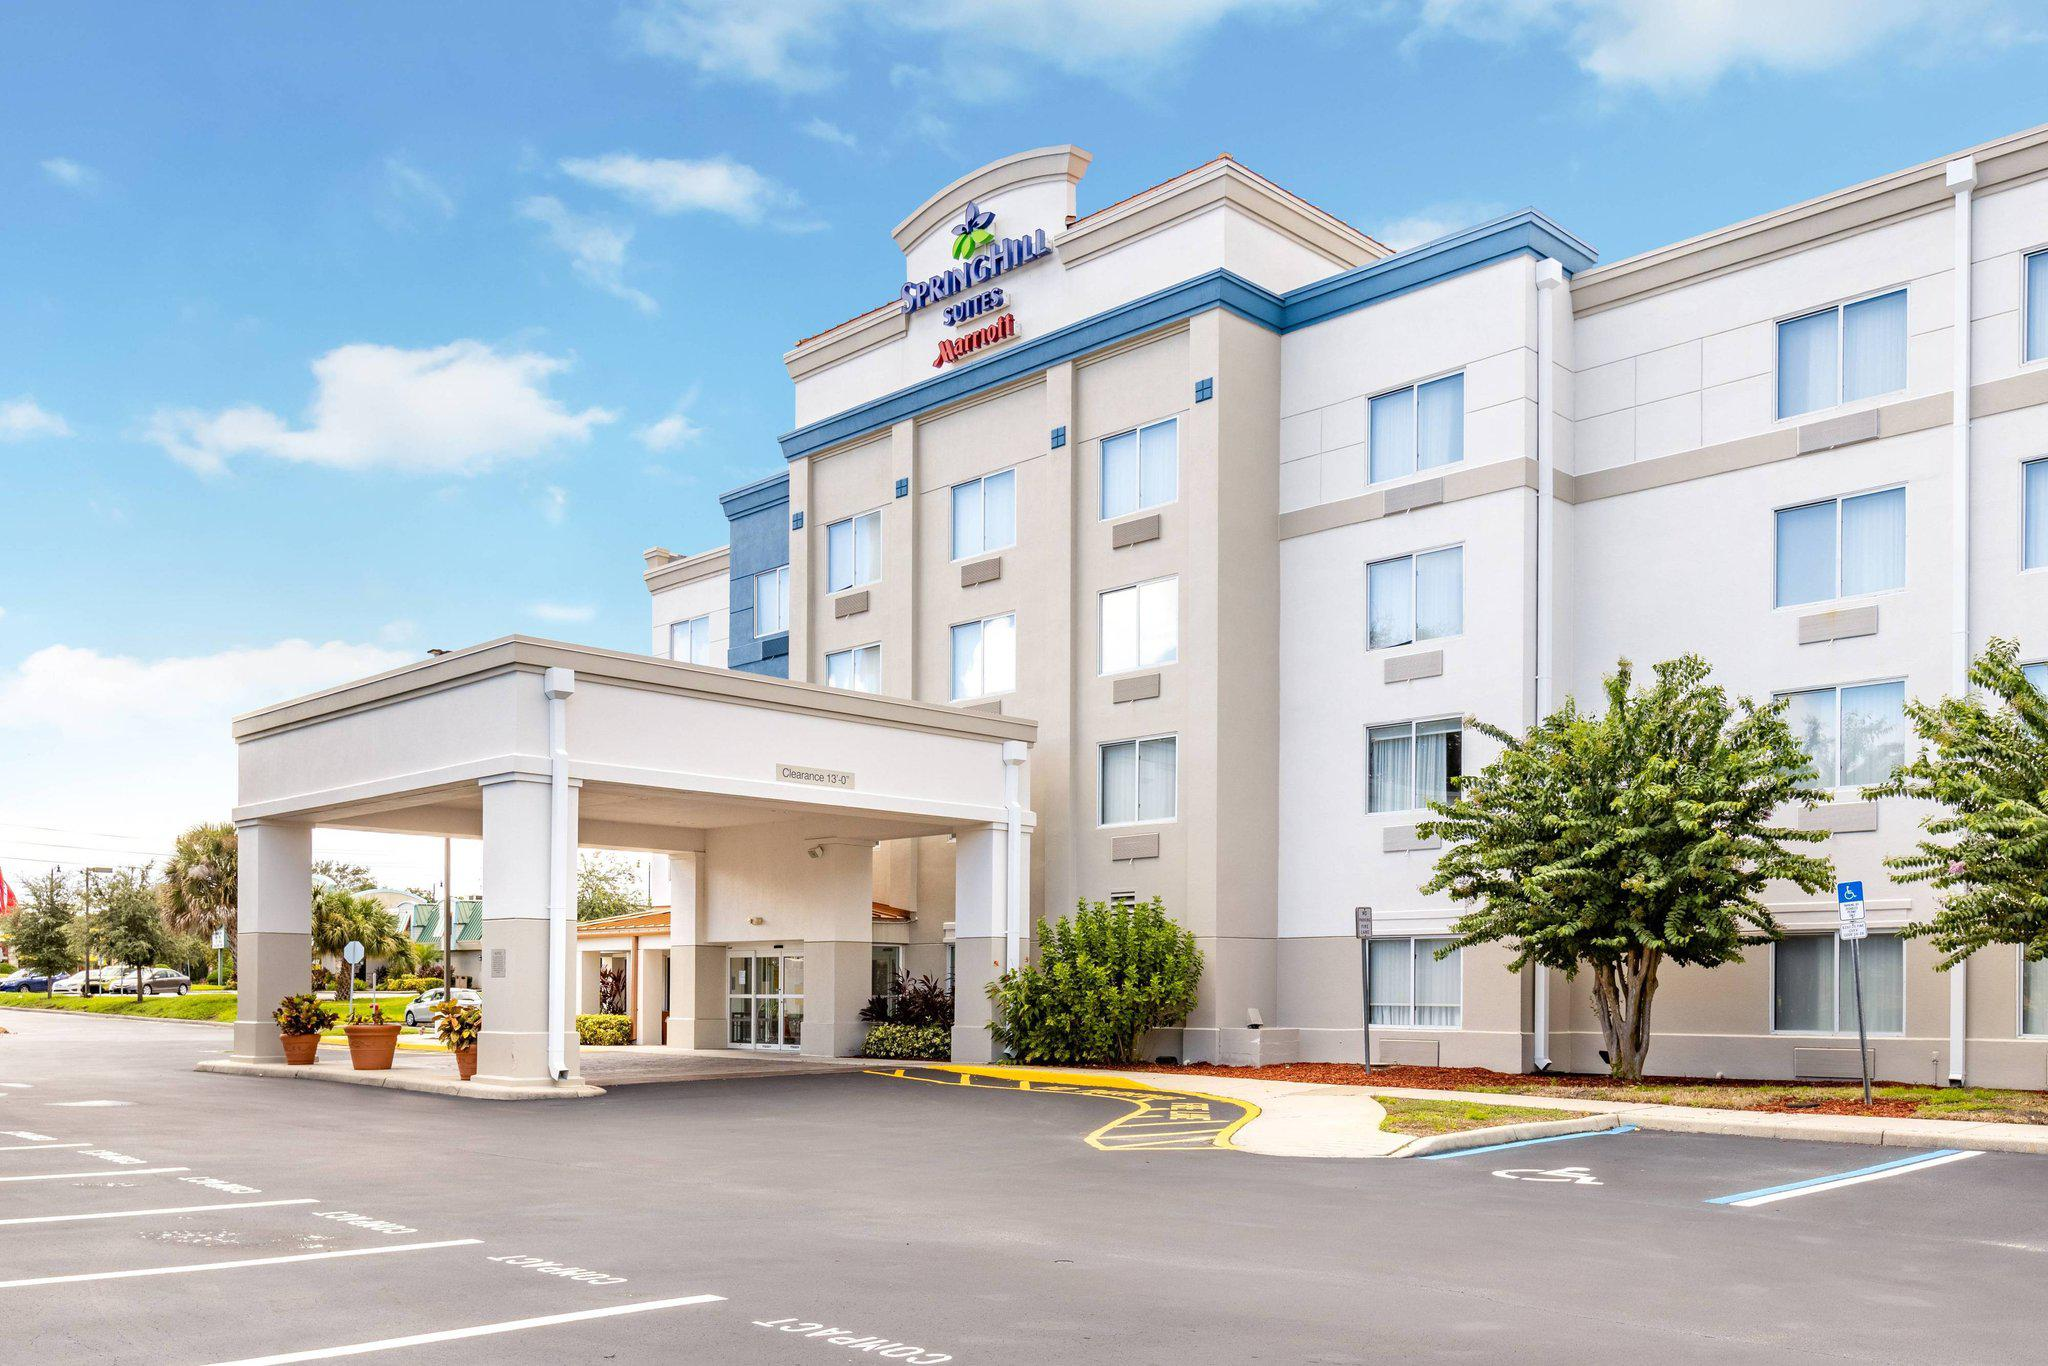 SpringHill Suites by Marriott Orlando Altamonte Springs/Maitland